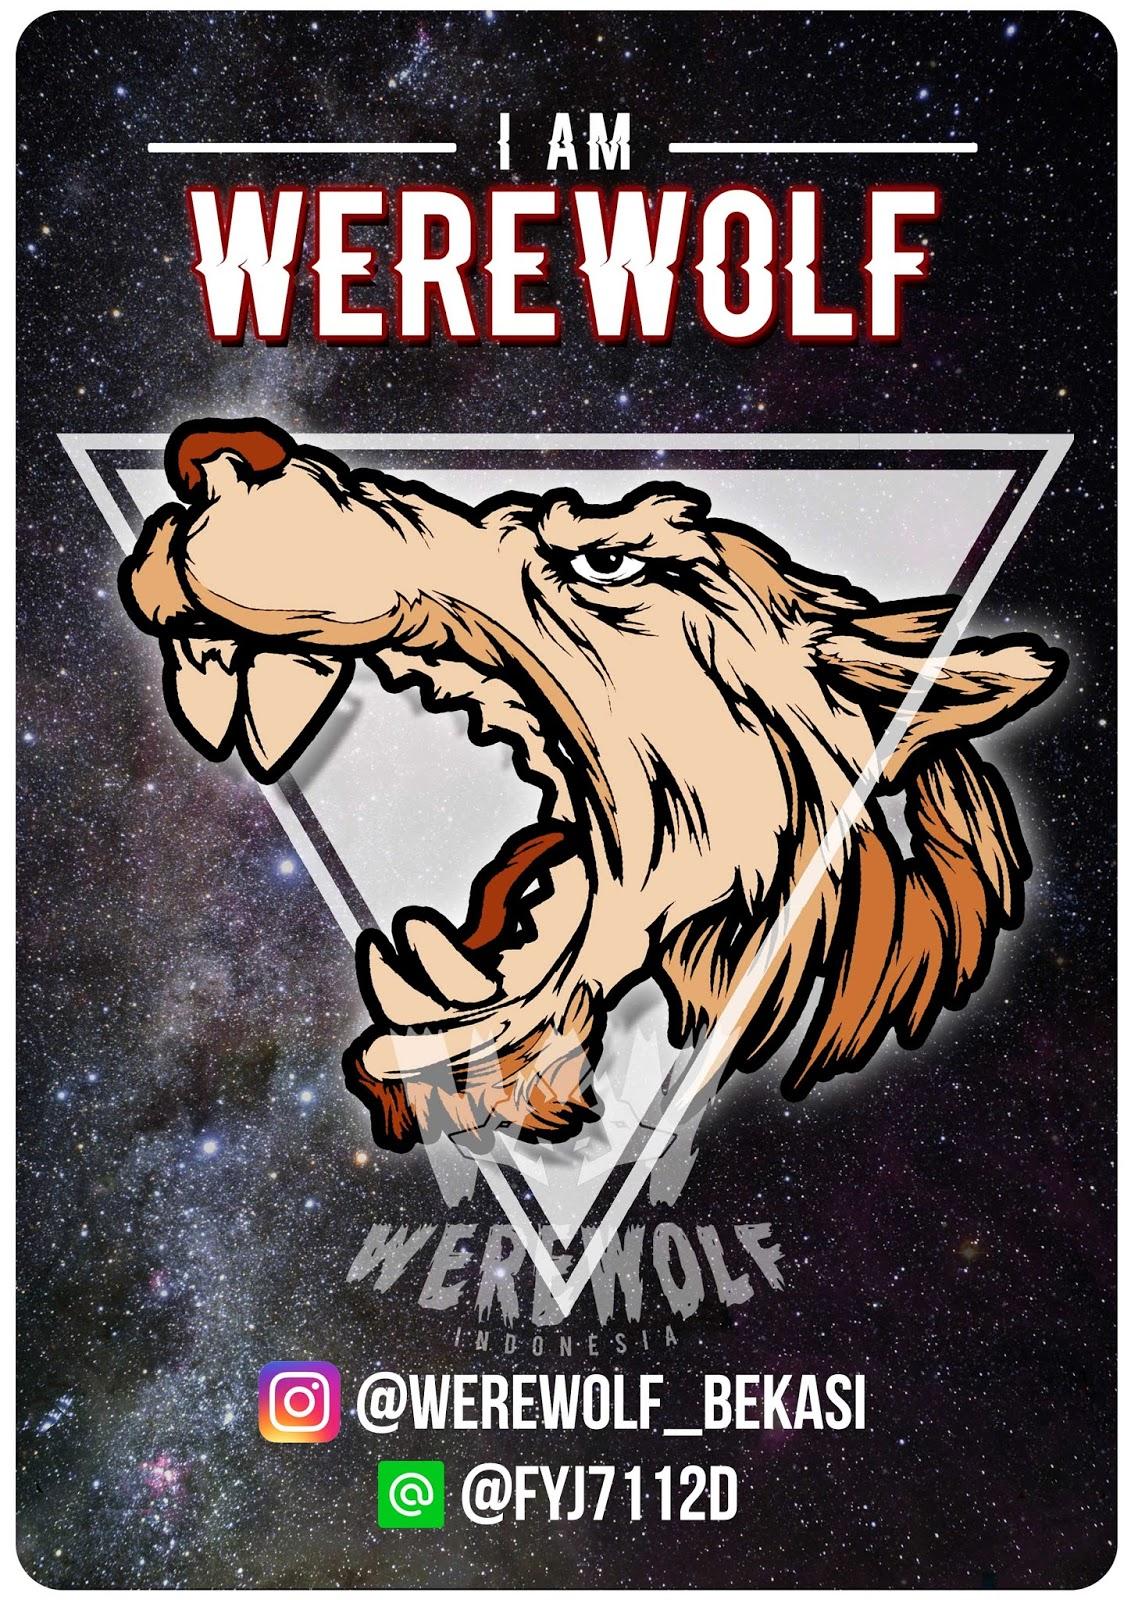 Karakter Werewolf Game